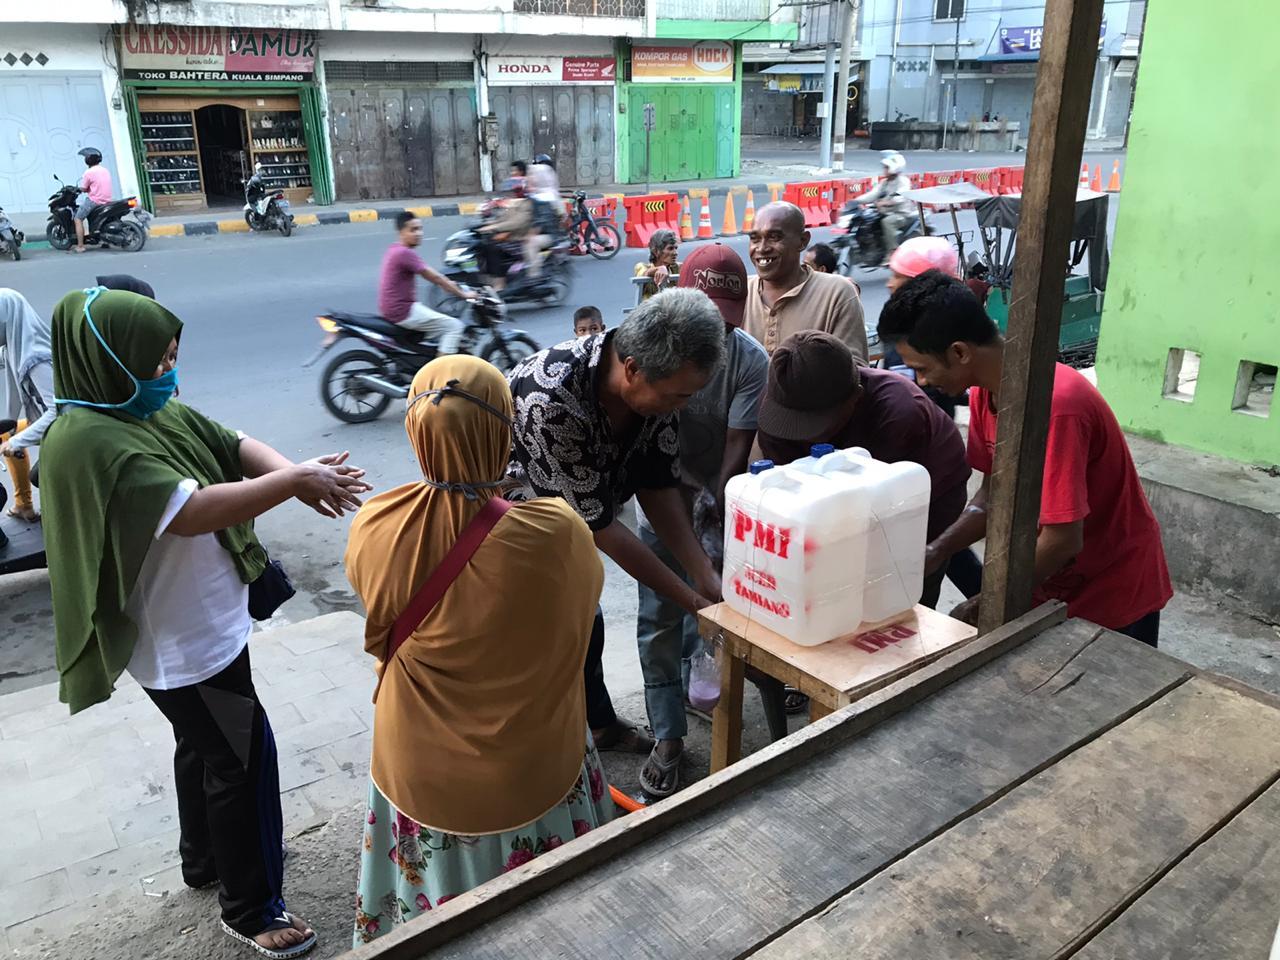 Cegah Corona, PMI Aceh Tamiang Sediakan Tempat Cuci Tangan di Pajak dan Masjid